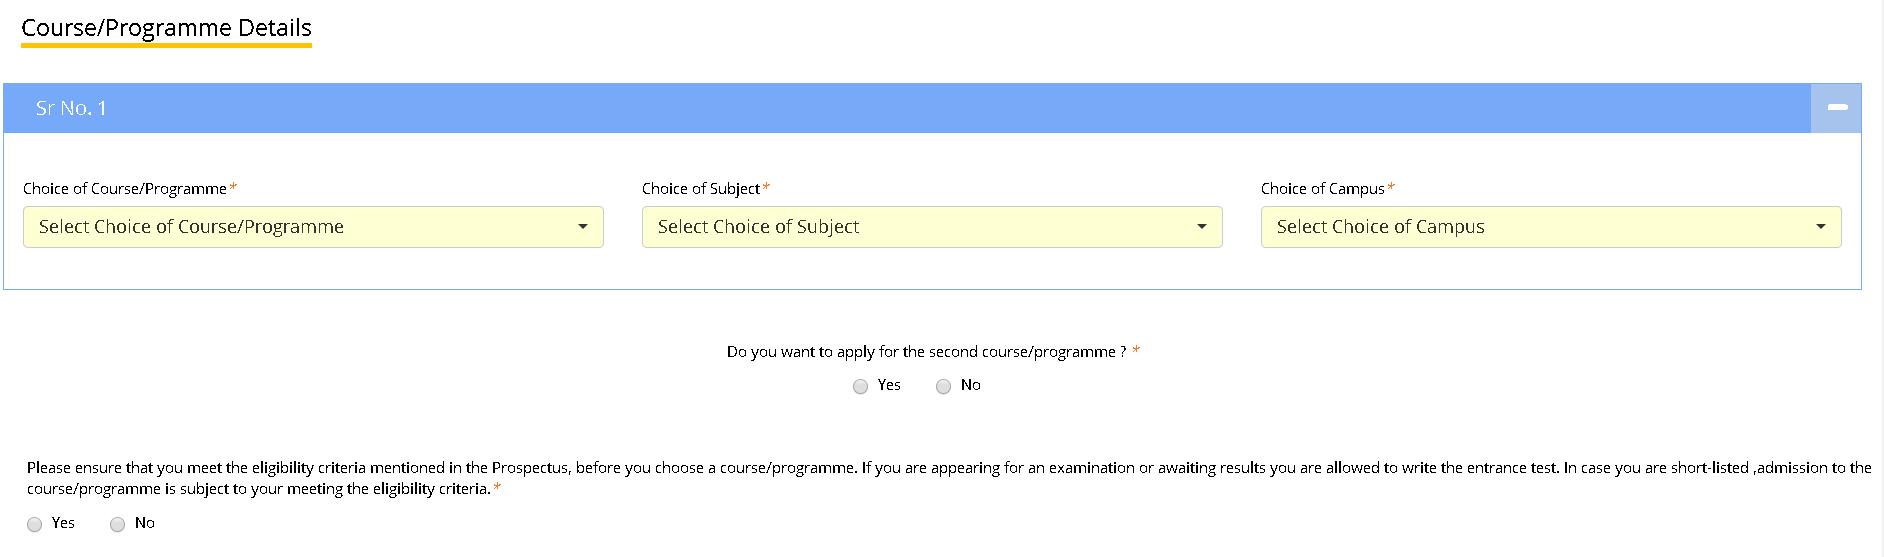 EFLU Application Form Educational Details